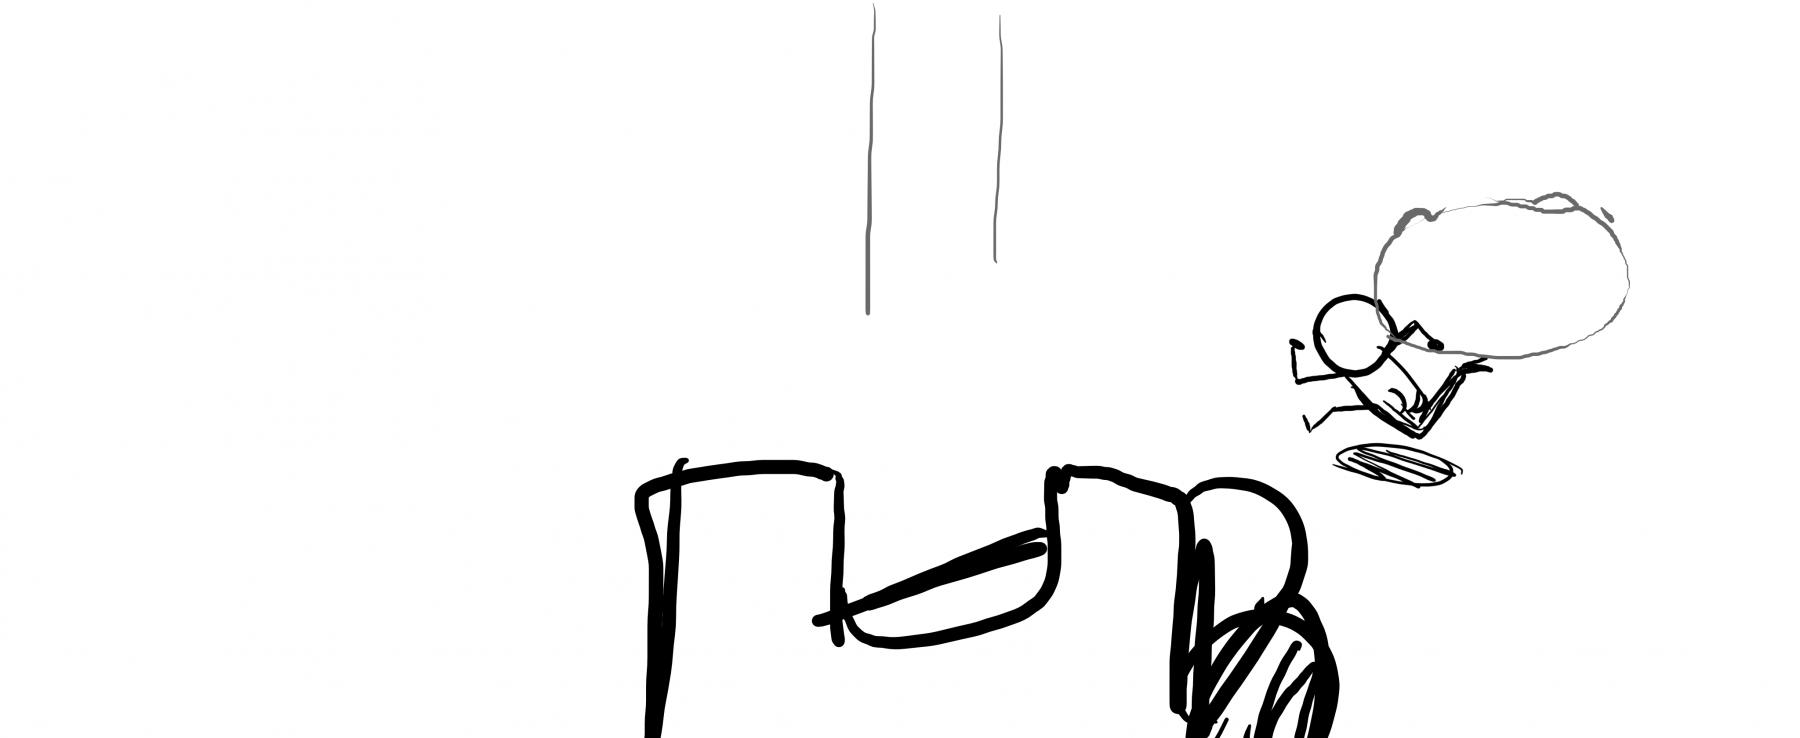 Nut-Thumbnail-Rough-Board00280